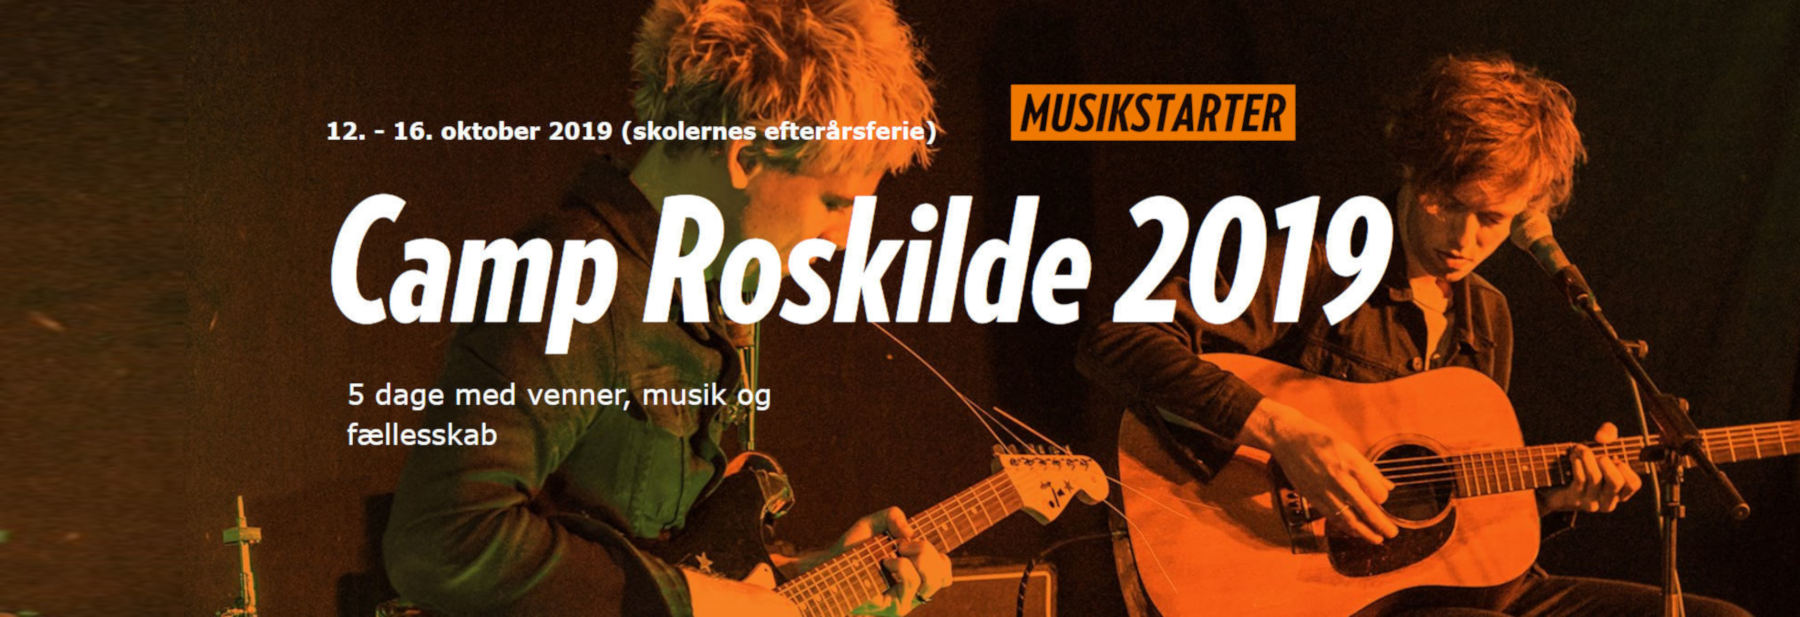 Musikstarter Camp Roskilde